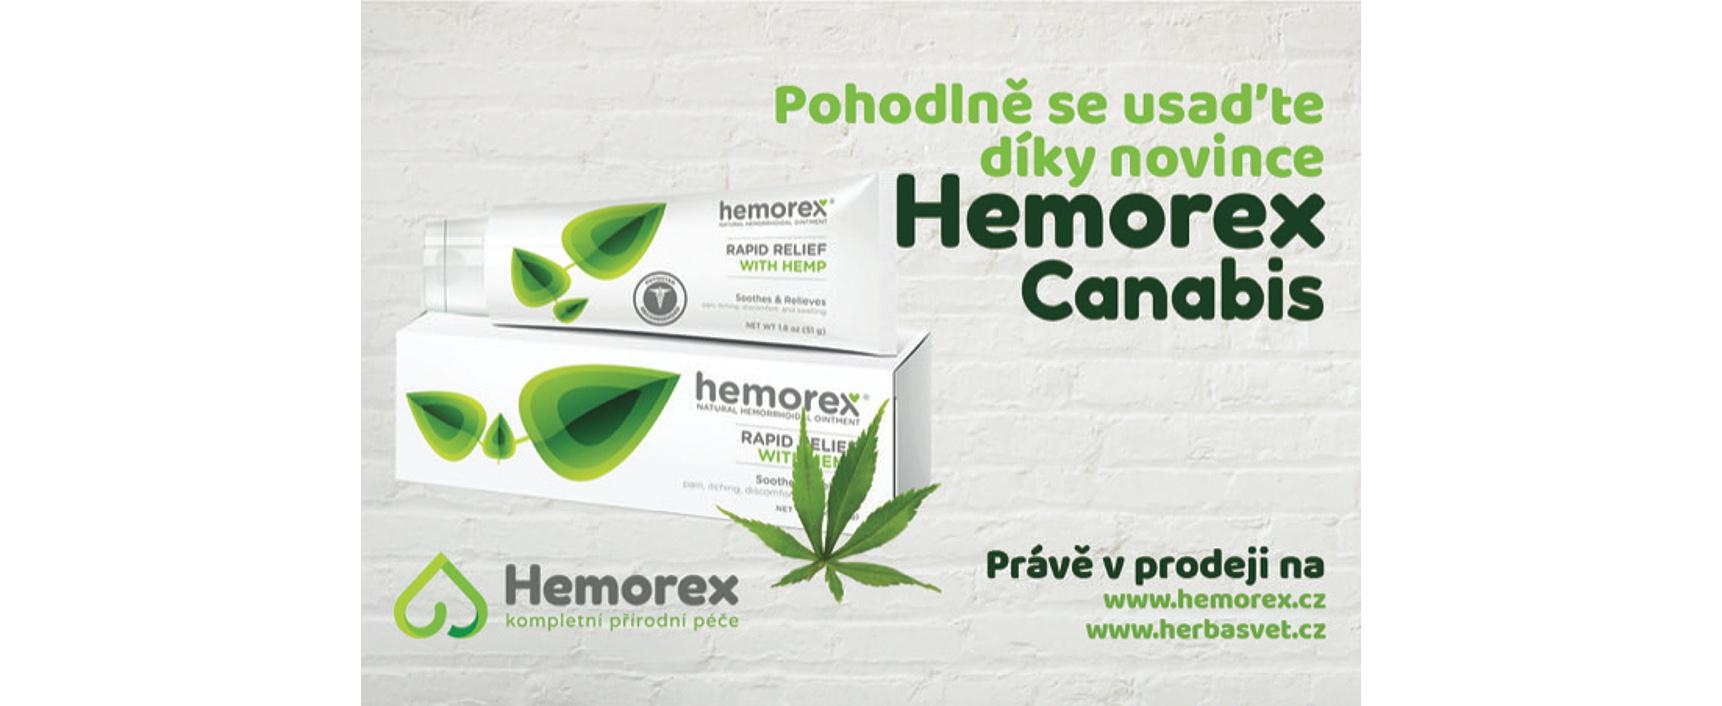 Hemorex Cannabis